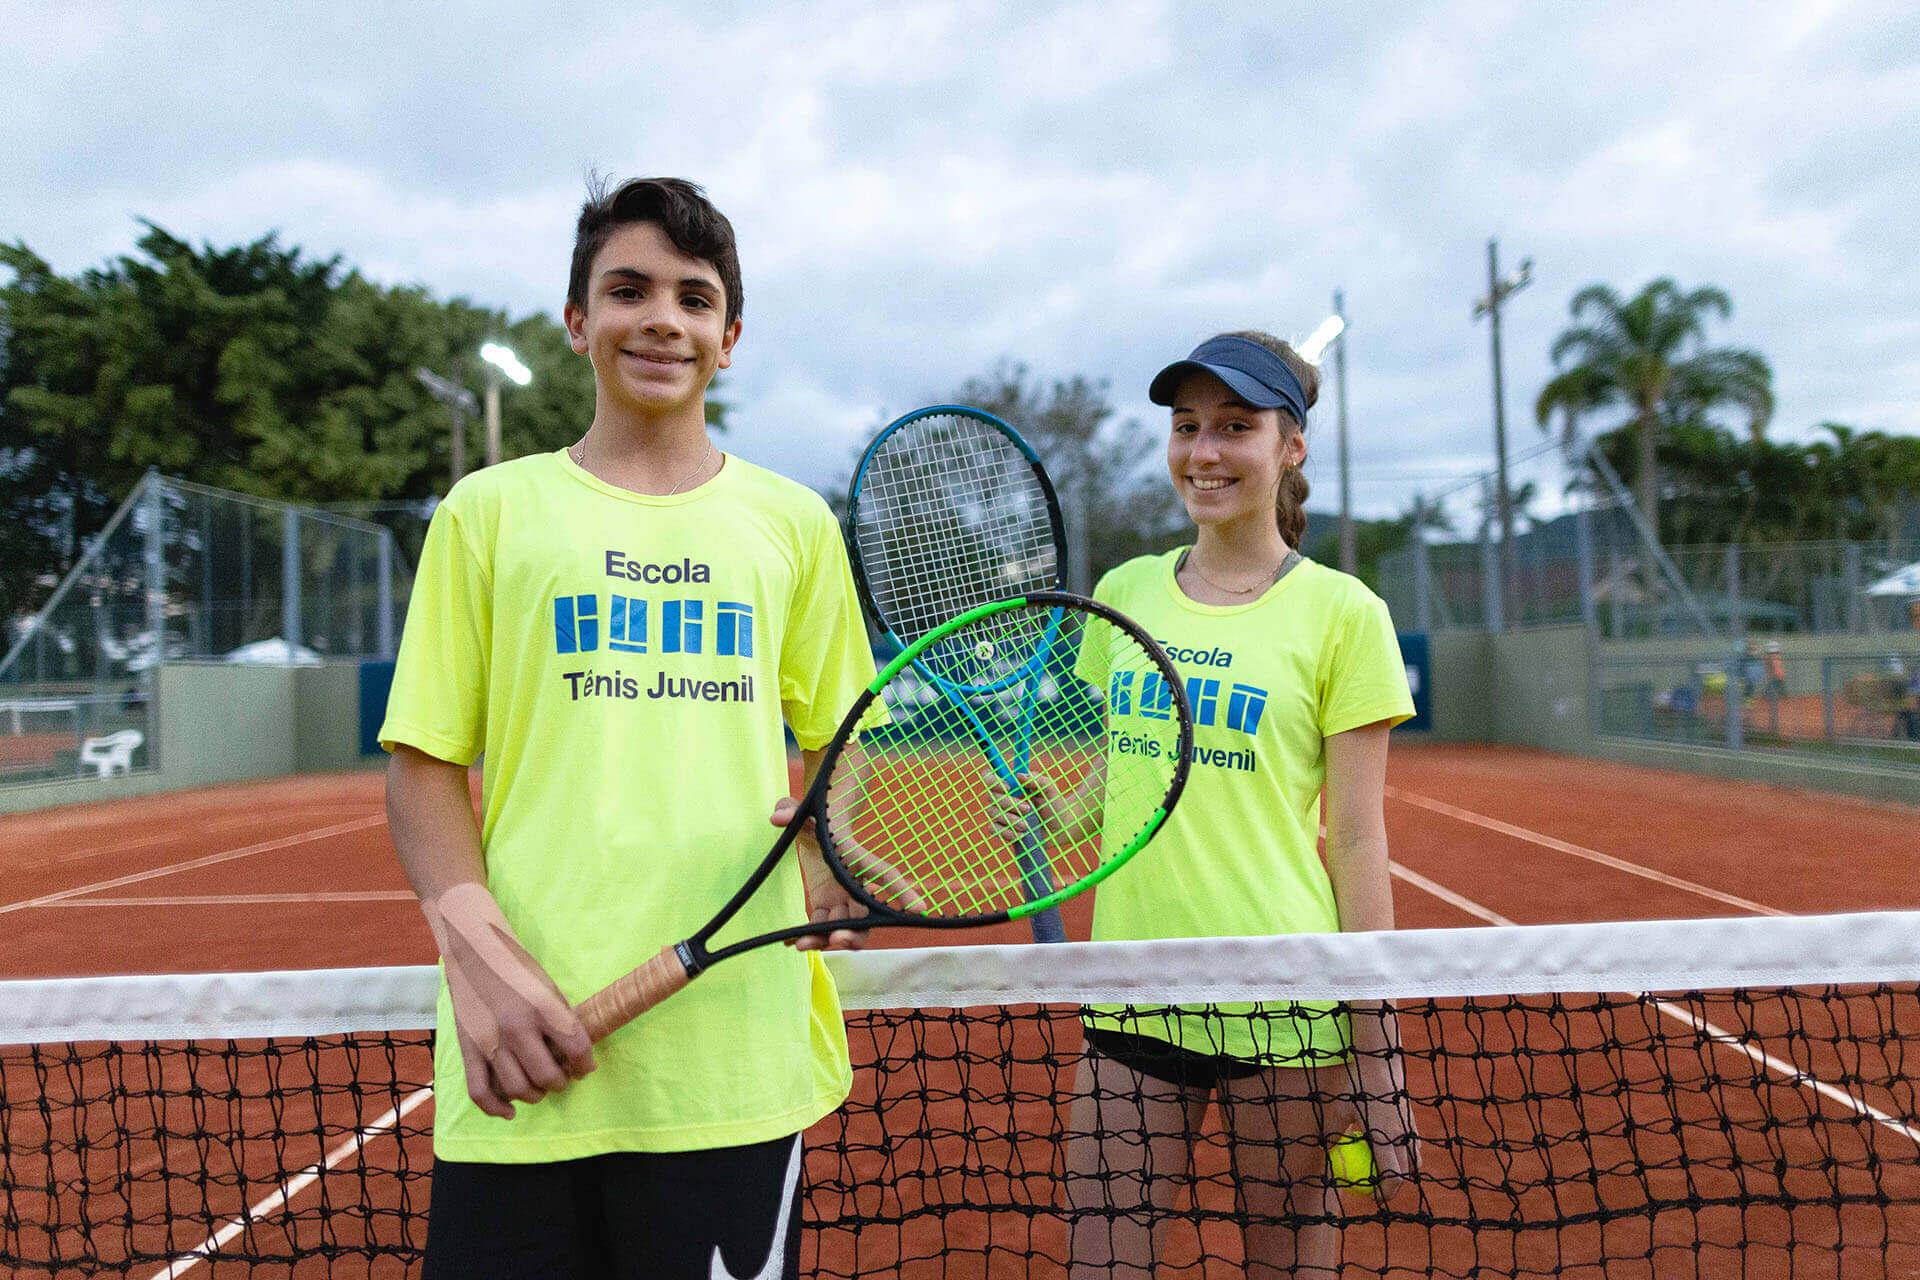 Escola Guga Tênis Juvenil